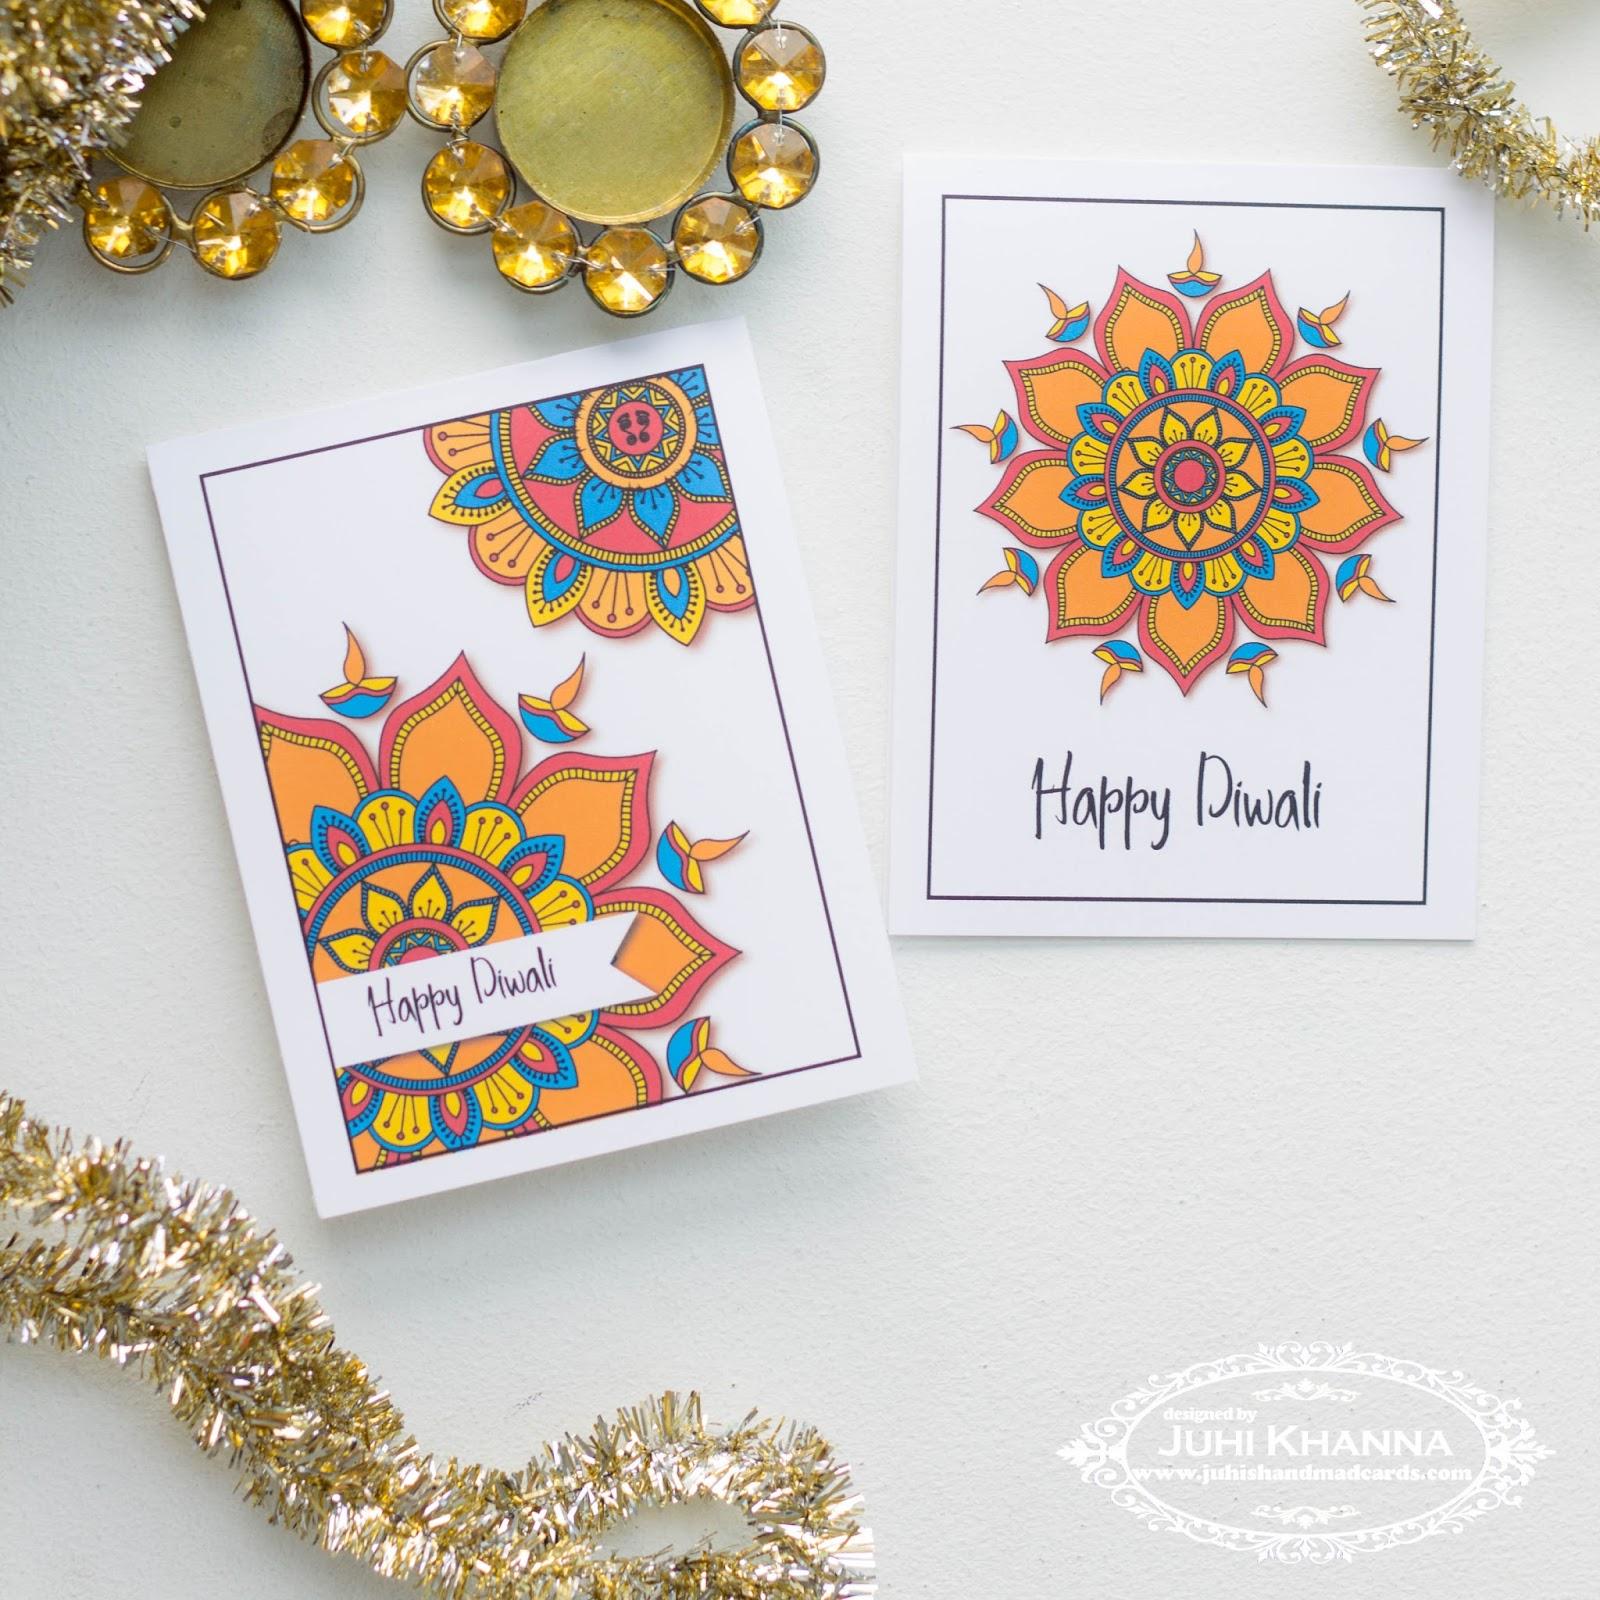 Juhis handmade cards october 2016 free printable diwali cards m4hsunfo